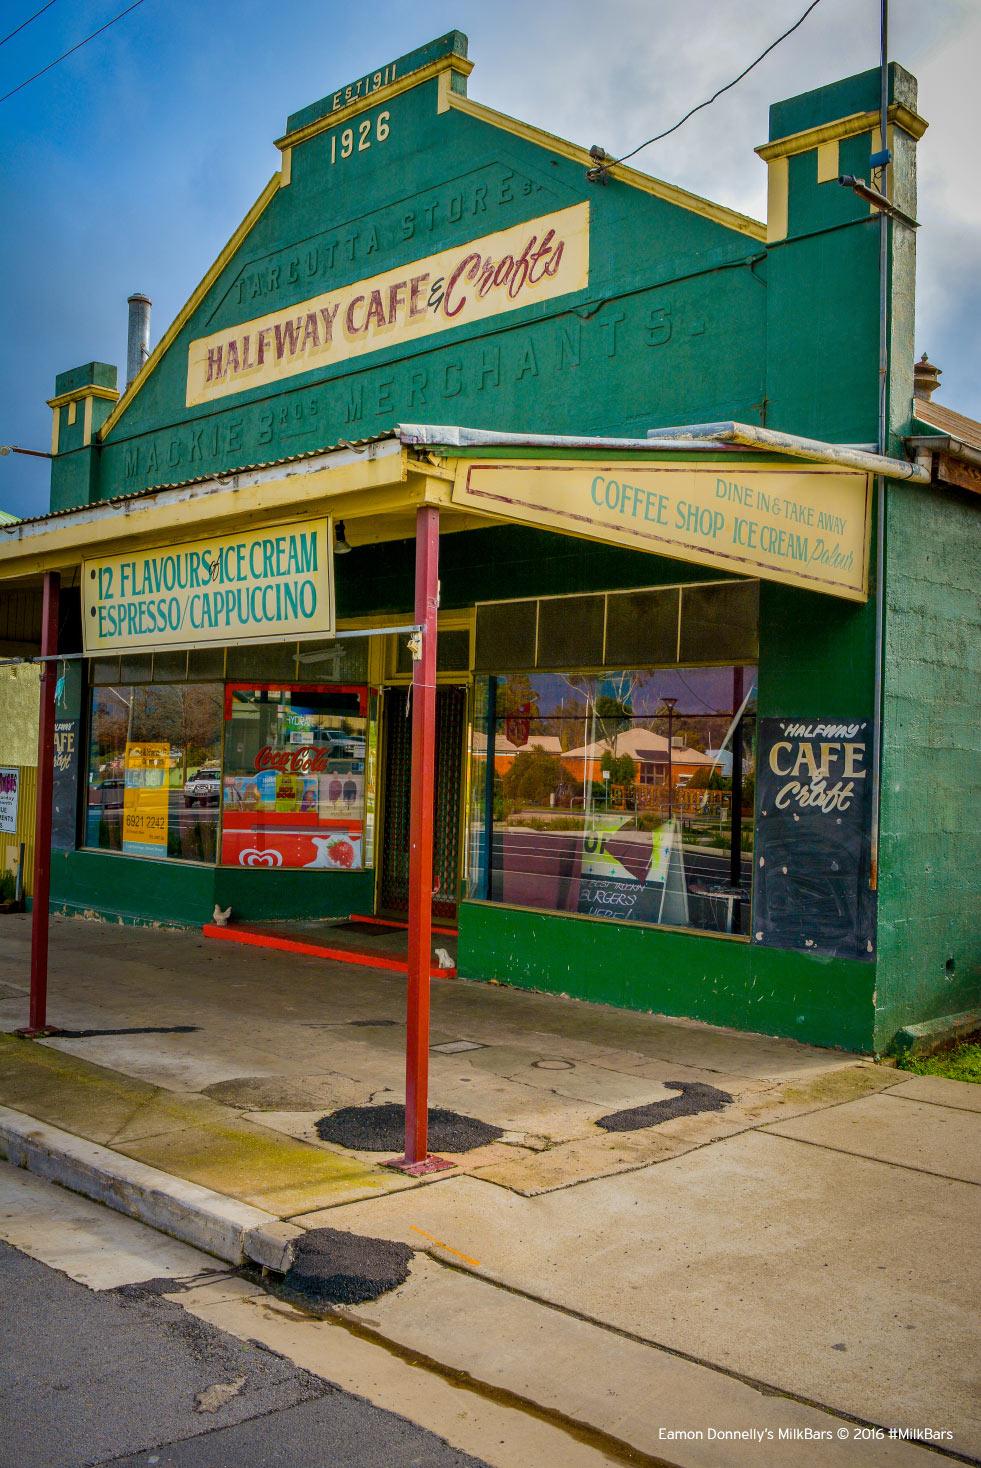 Tarcutta-Halfway-Cafe-Milk-Bar-Eamon-Donnelly's-Milk-Bars-Book-Project-(c)-2001-2016.jpg